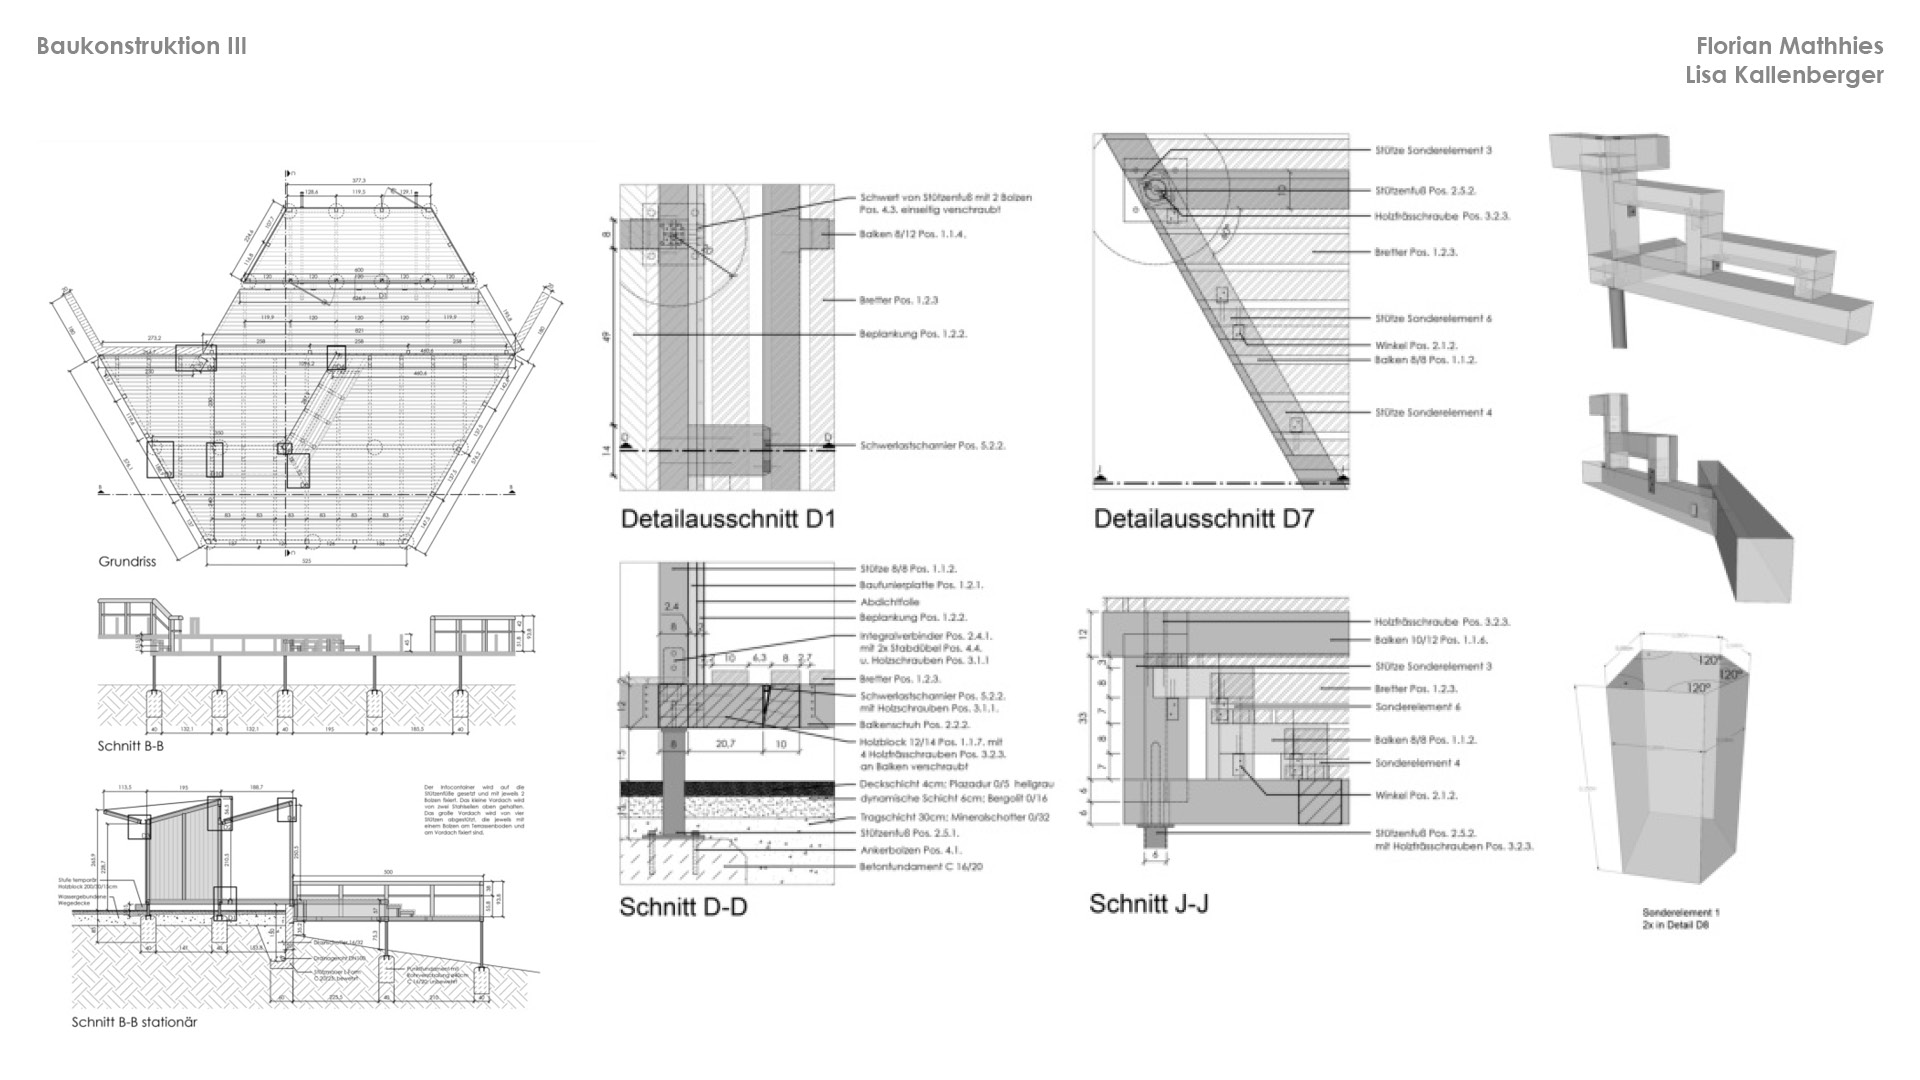 04 2013 3 BaukonstruktionIII